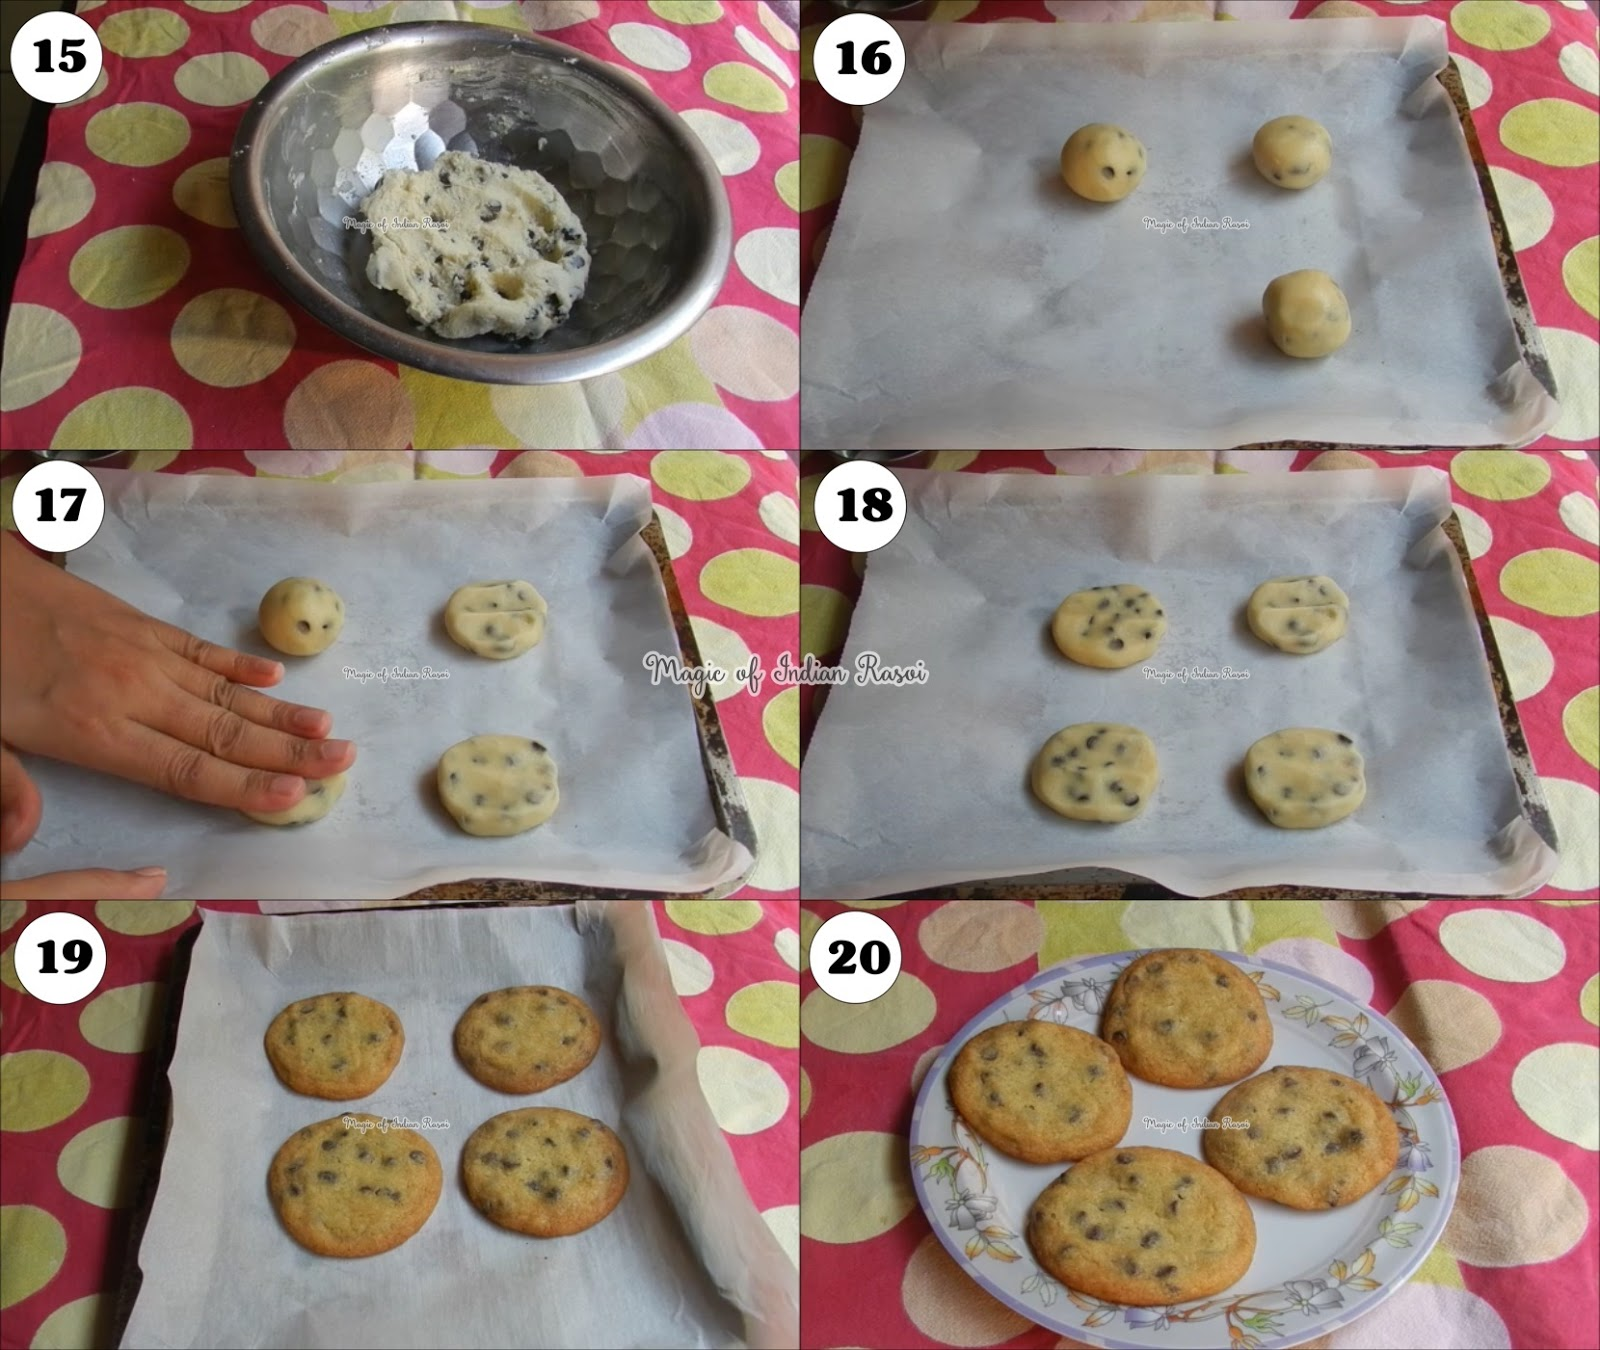 Eggless Chocolate Chip Cookies Recipe - Best Chocolate Chip Cookies at Home - एग्ग्लेस चॉकलेट चिप कुकीज रेसिपी - घर पर बनाये सर्वश्रेष्ठ चॉकलेट चिप कुकीज - Priya R - Magic of Indian Rasoi